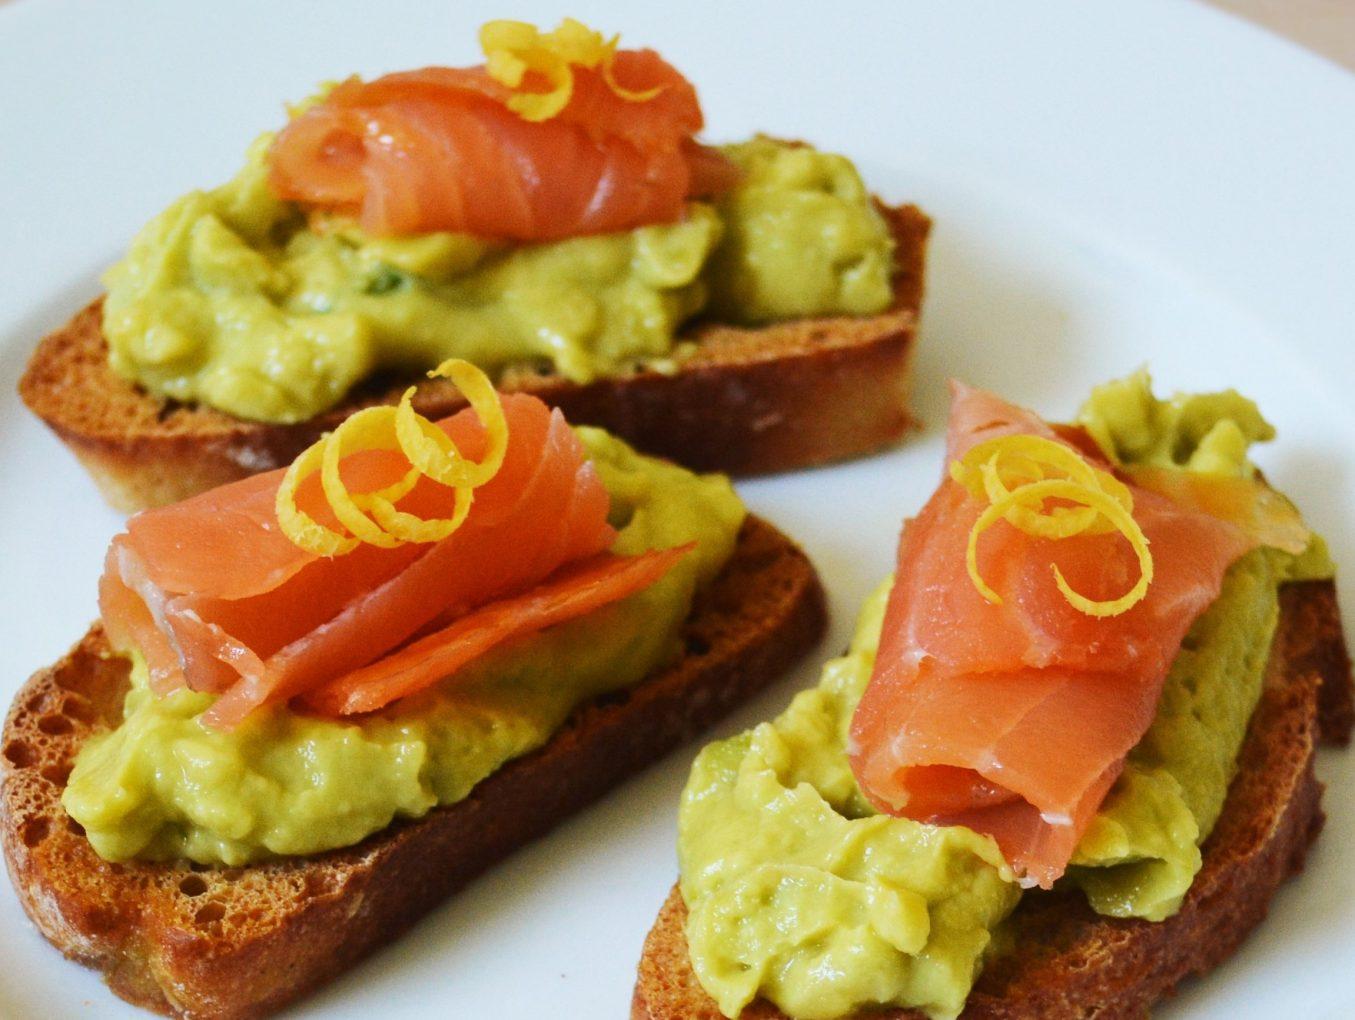 Avocado-Lachs-Bruschetta